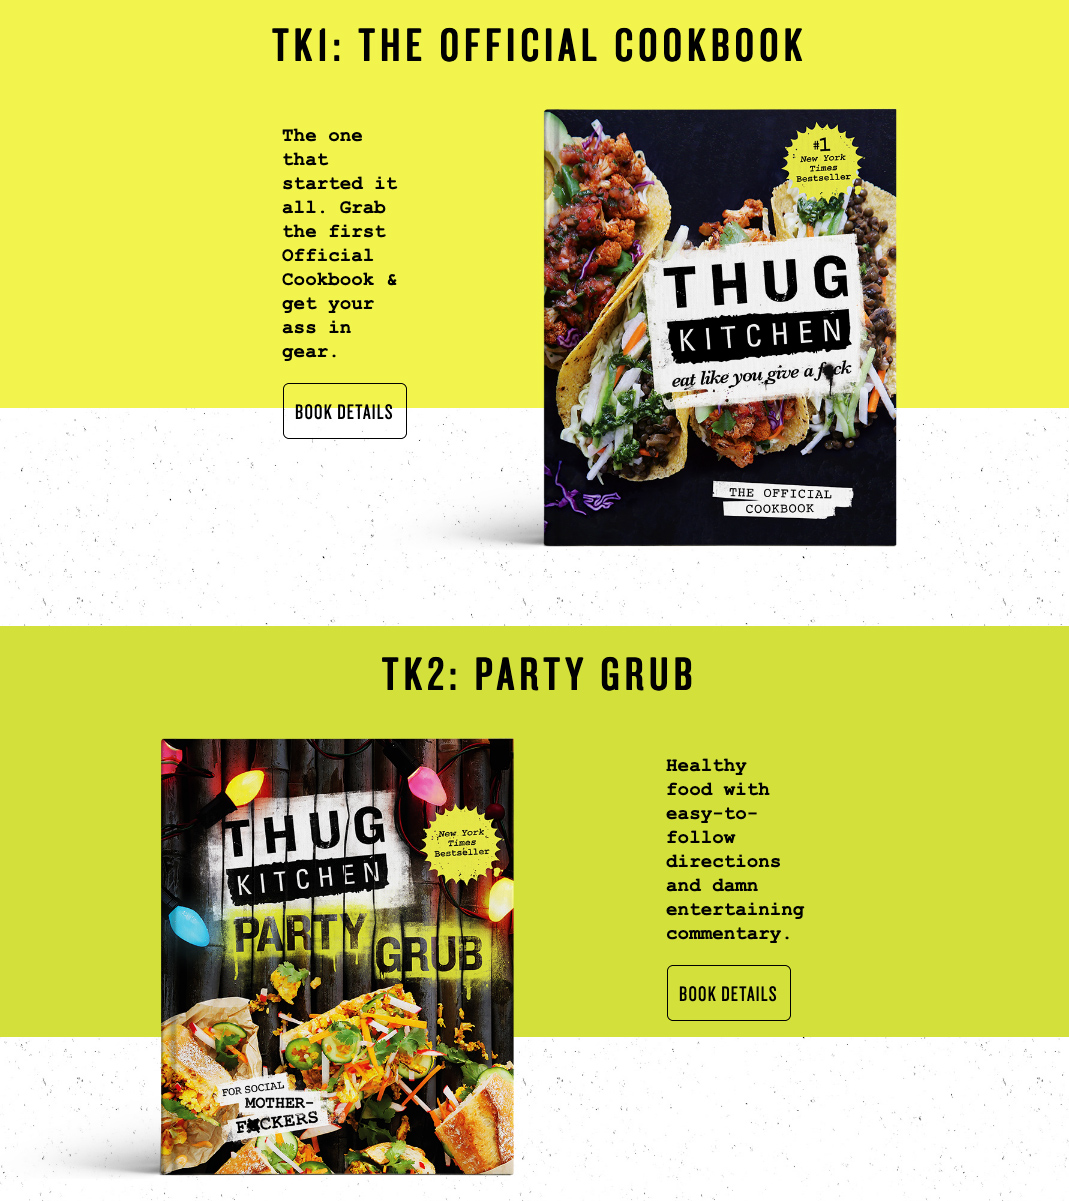 Thug Kitchen, vegan food blog, vegan recipies, vegan style, straight edge style, vegan website, vegan cookbook, vegan edge,